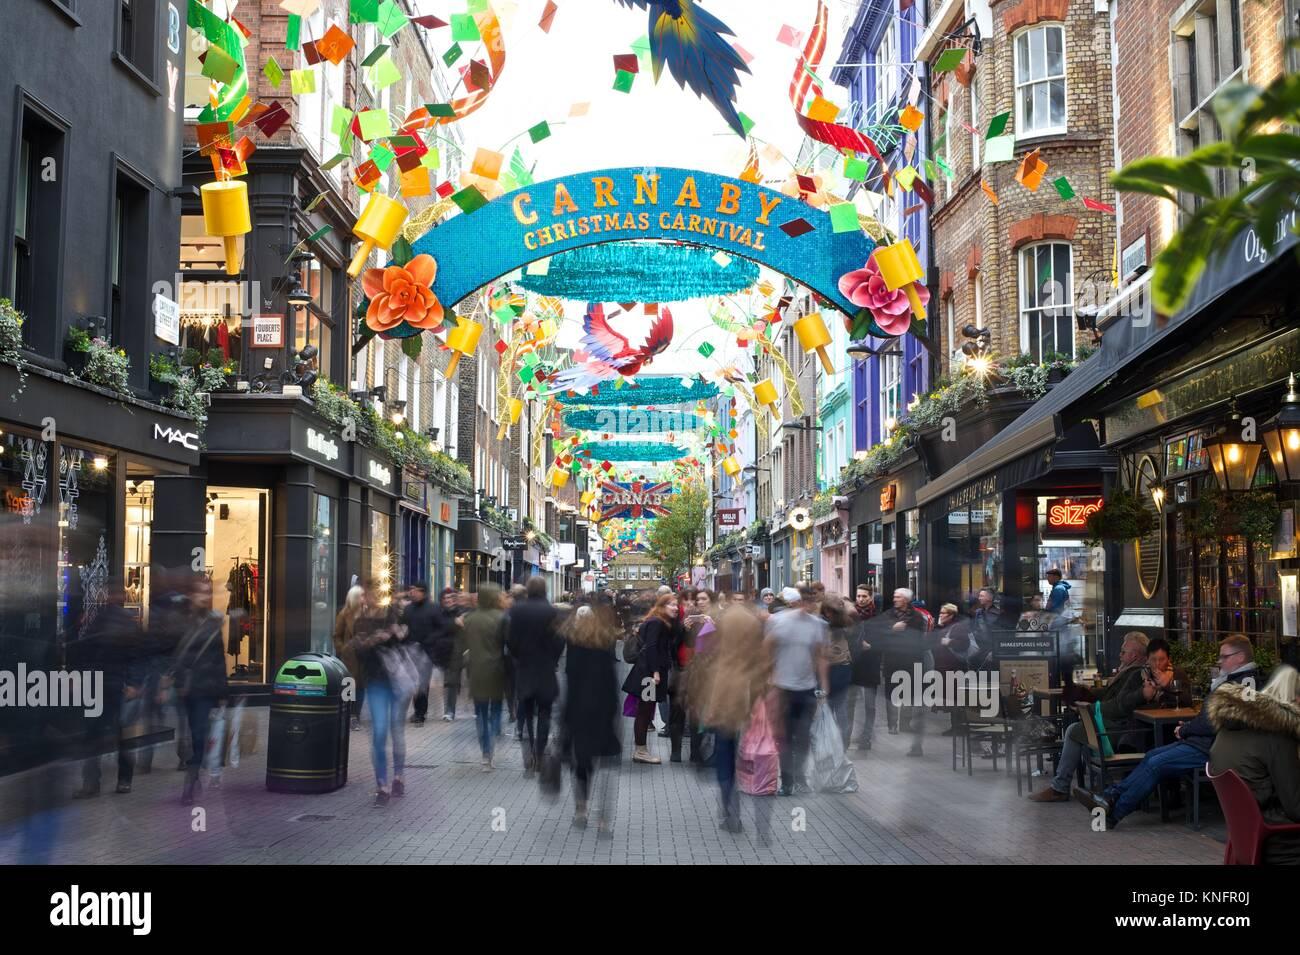 Carnaby Street, London - Stock Image